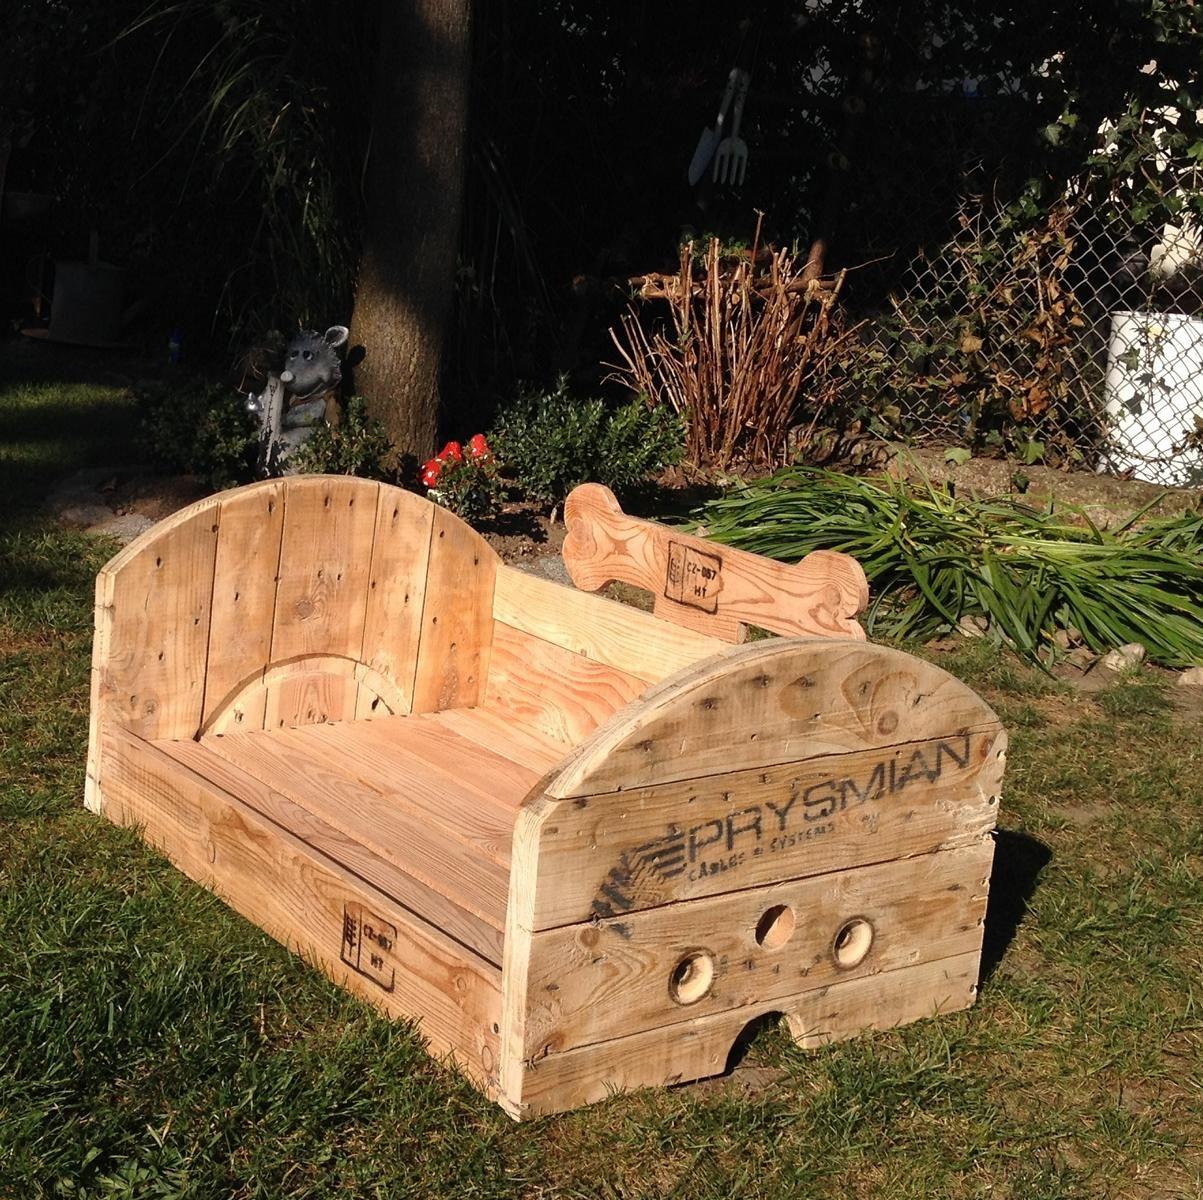 Hundebett Selber Bauen Anleitung vintage hundebett bauanleitung zum selber bauen heimwerker forum